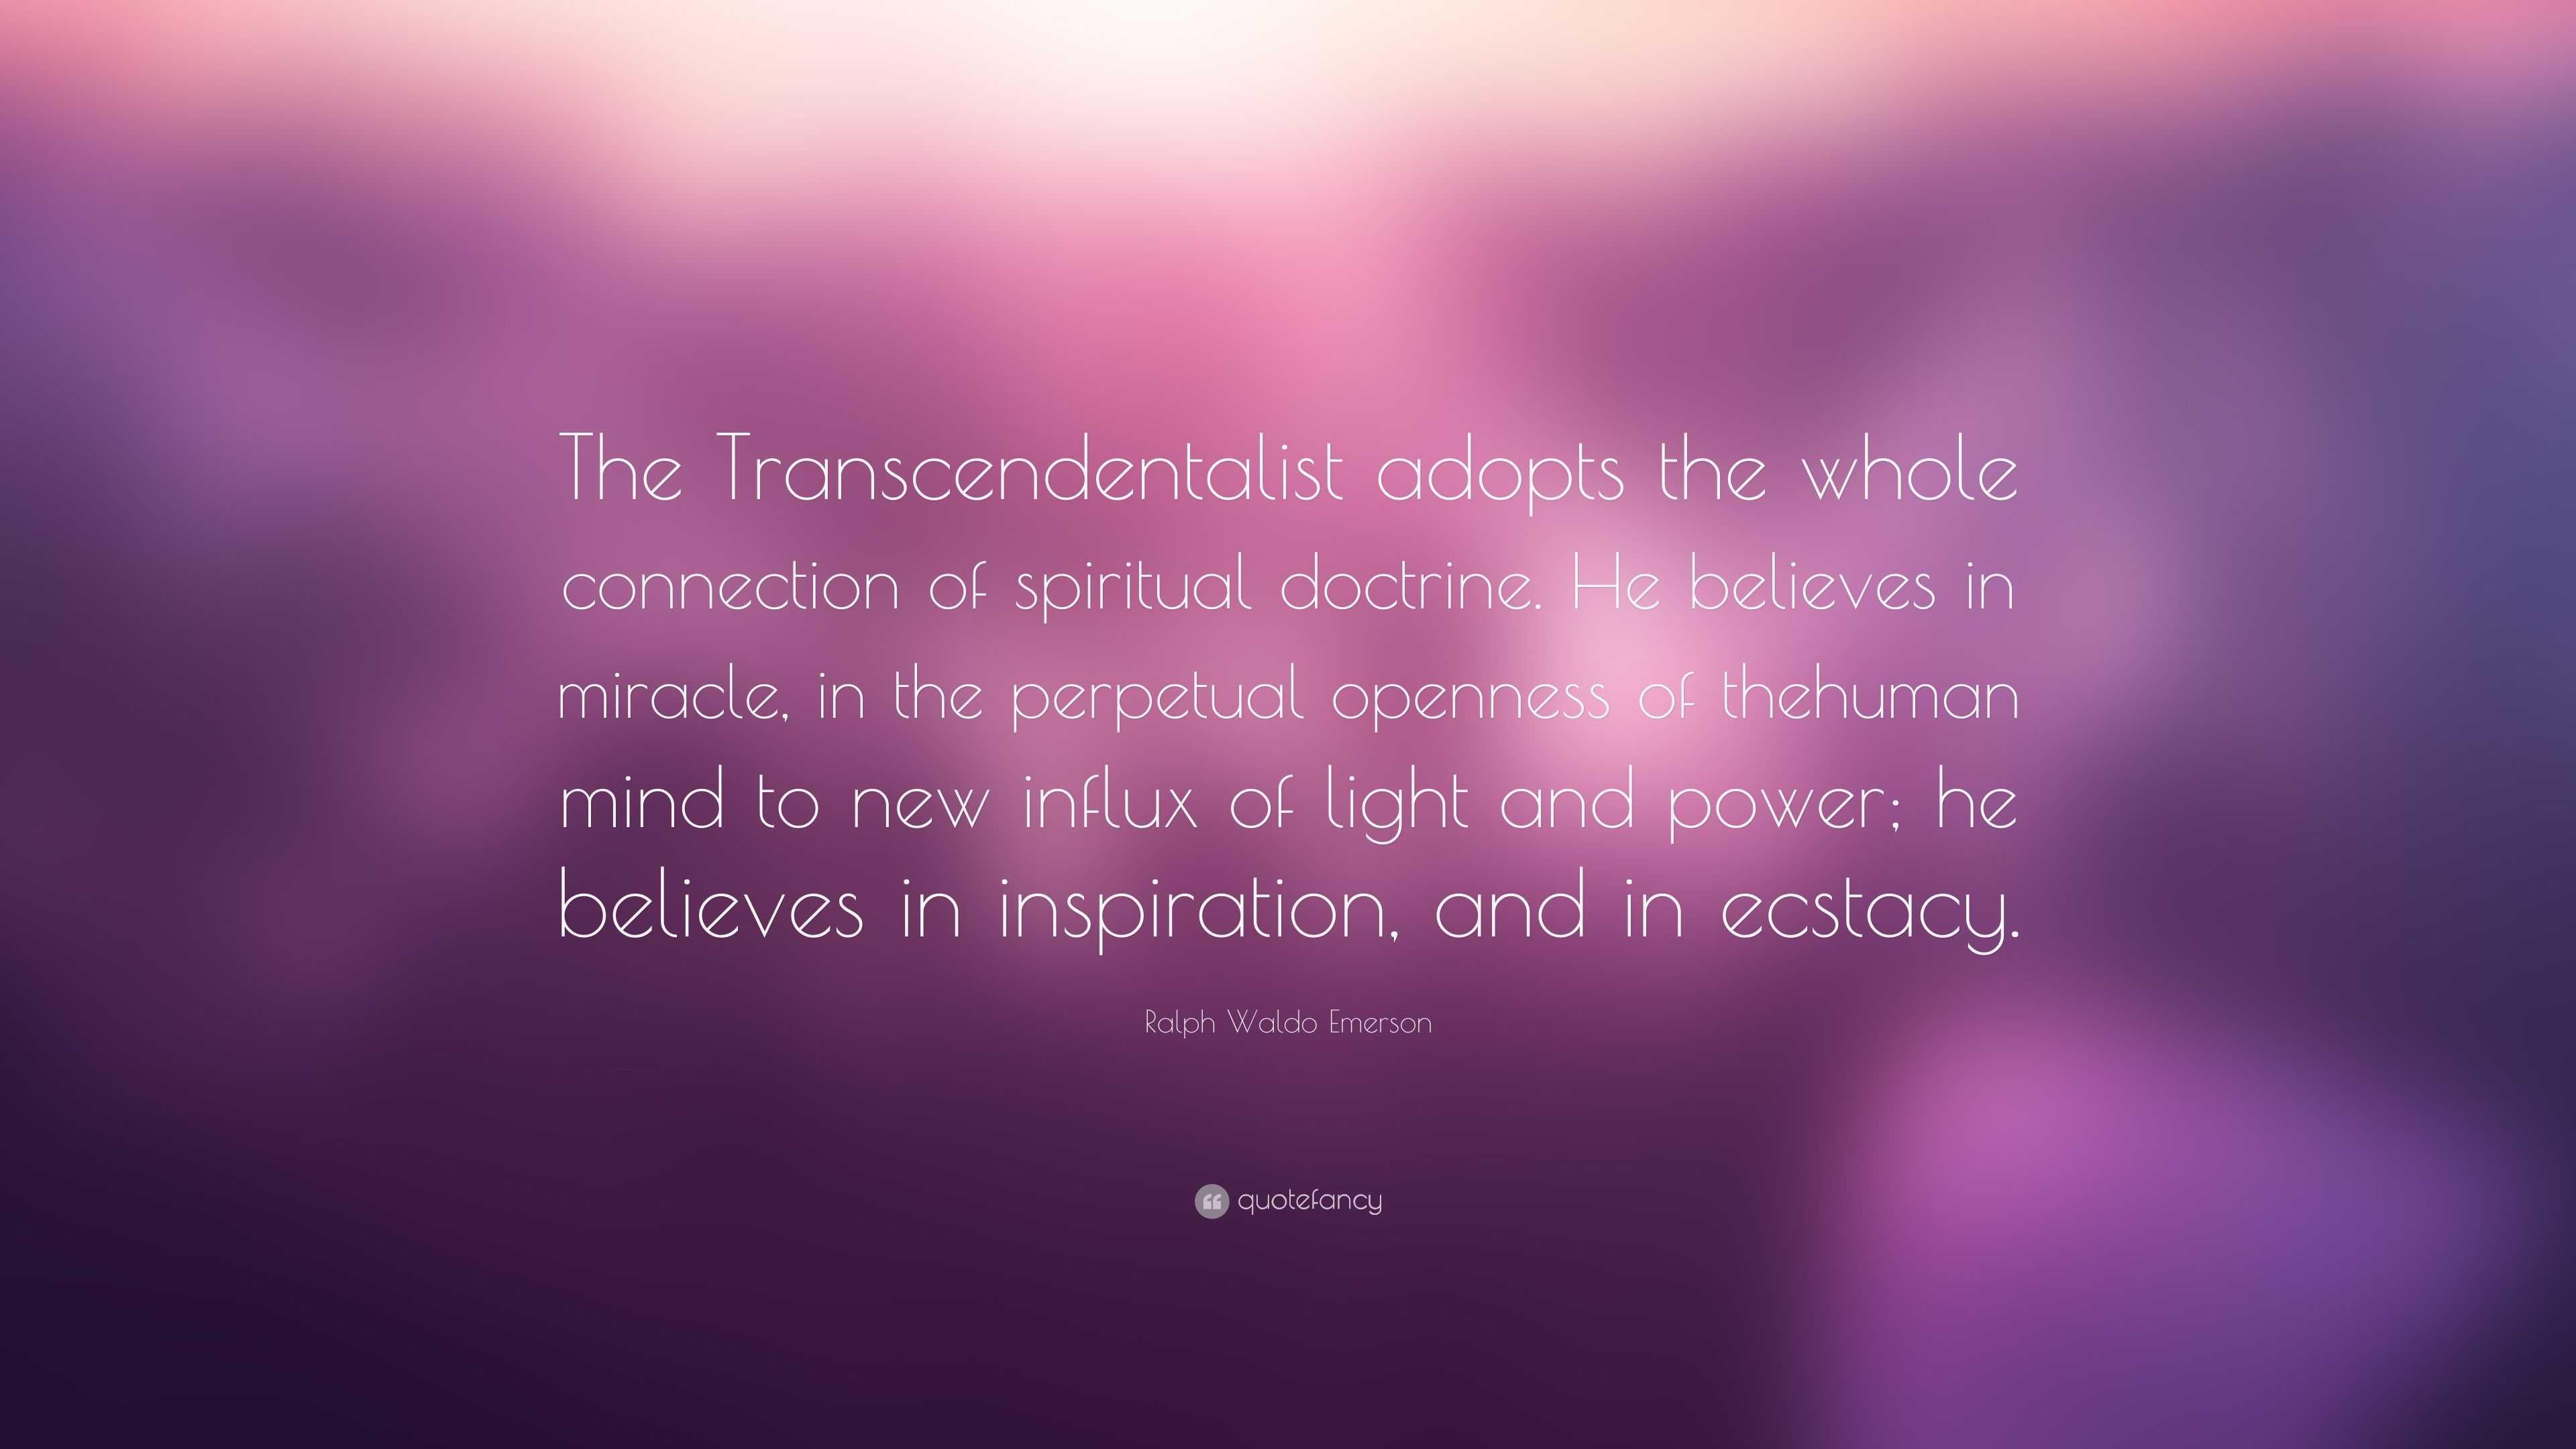 emerson essay the transcendentalist